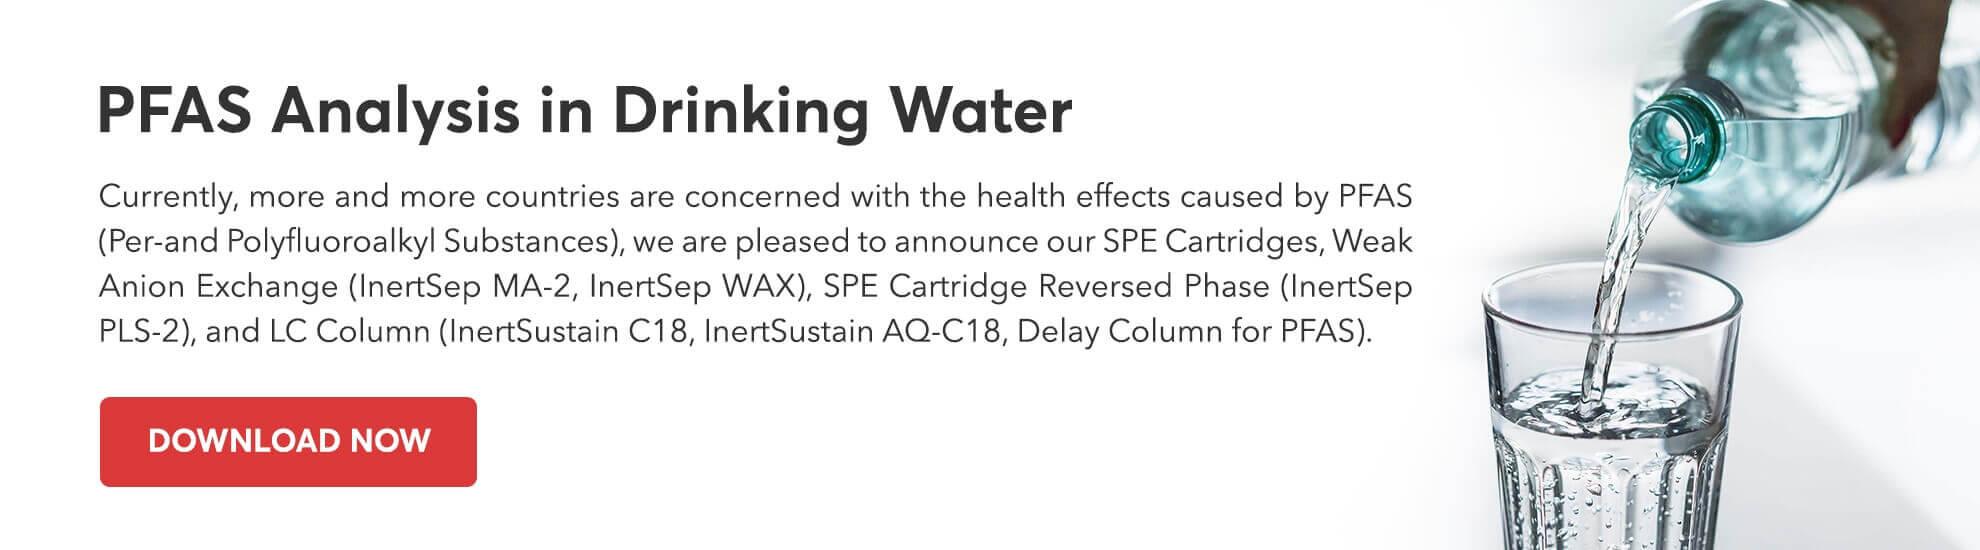 PFAS Analysis in Drinking Water